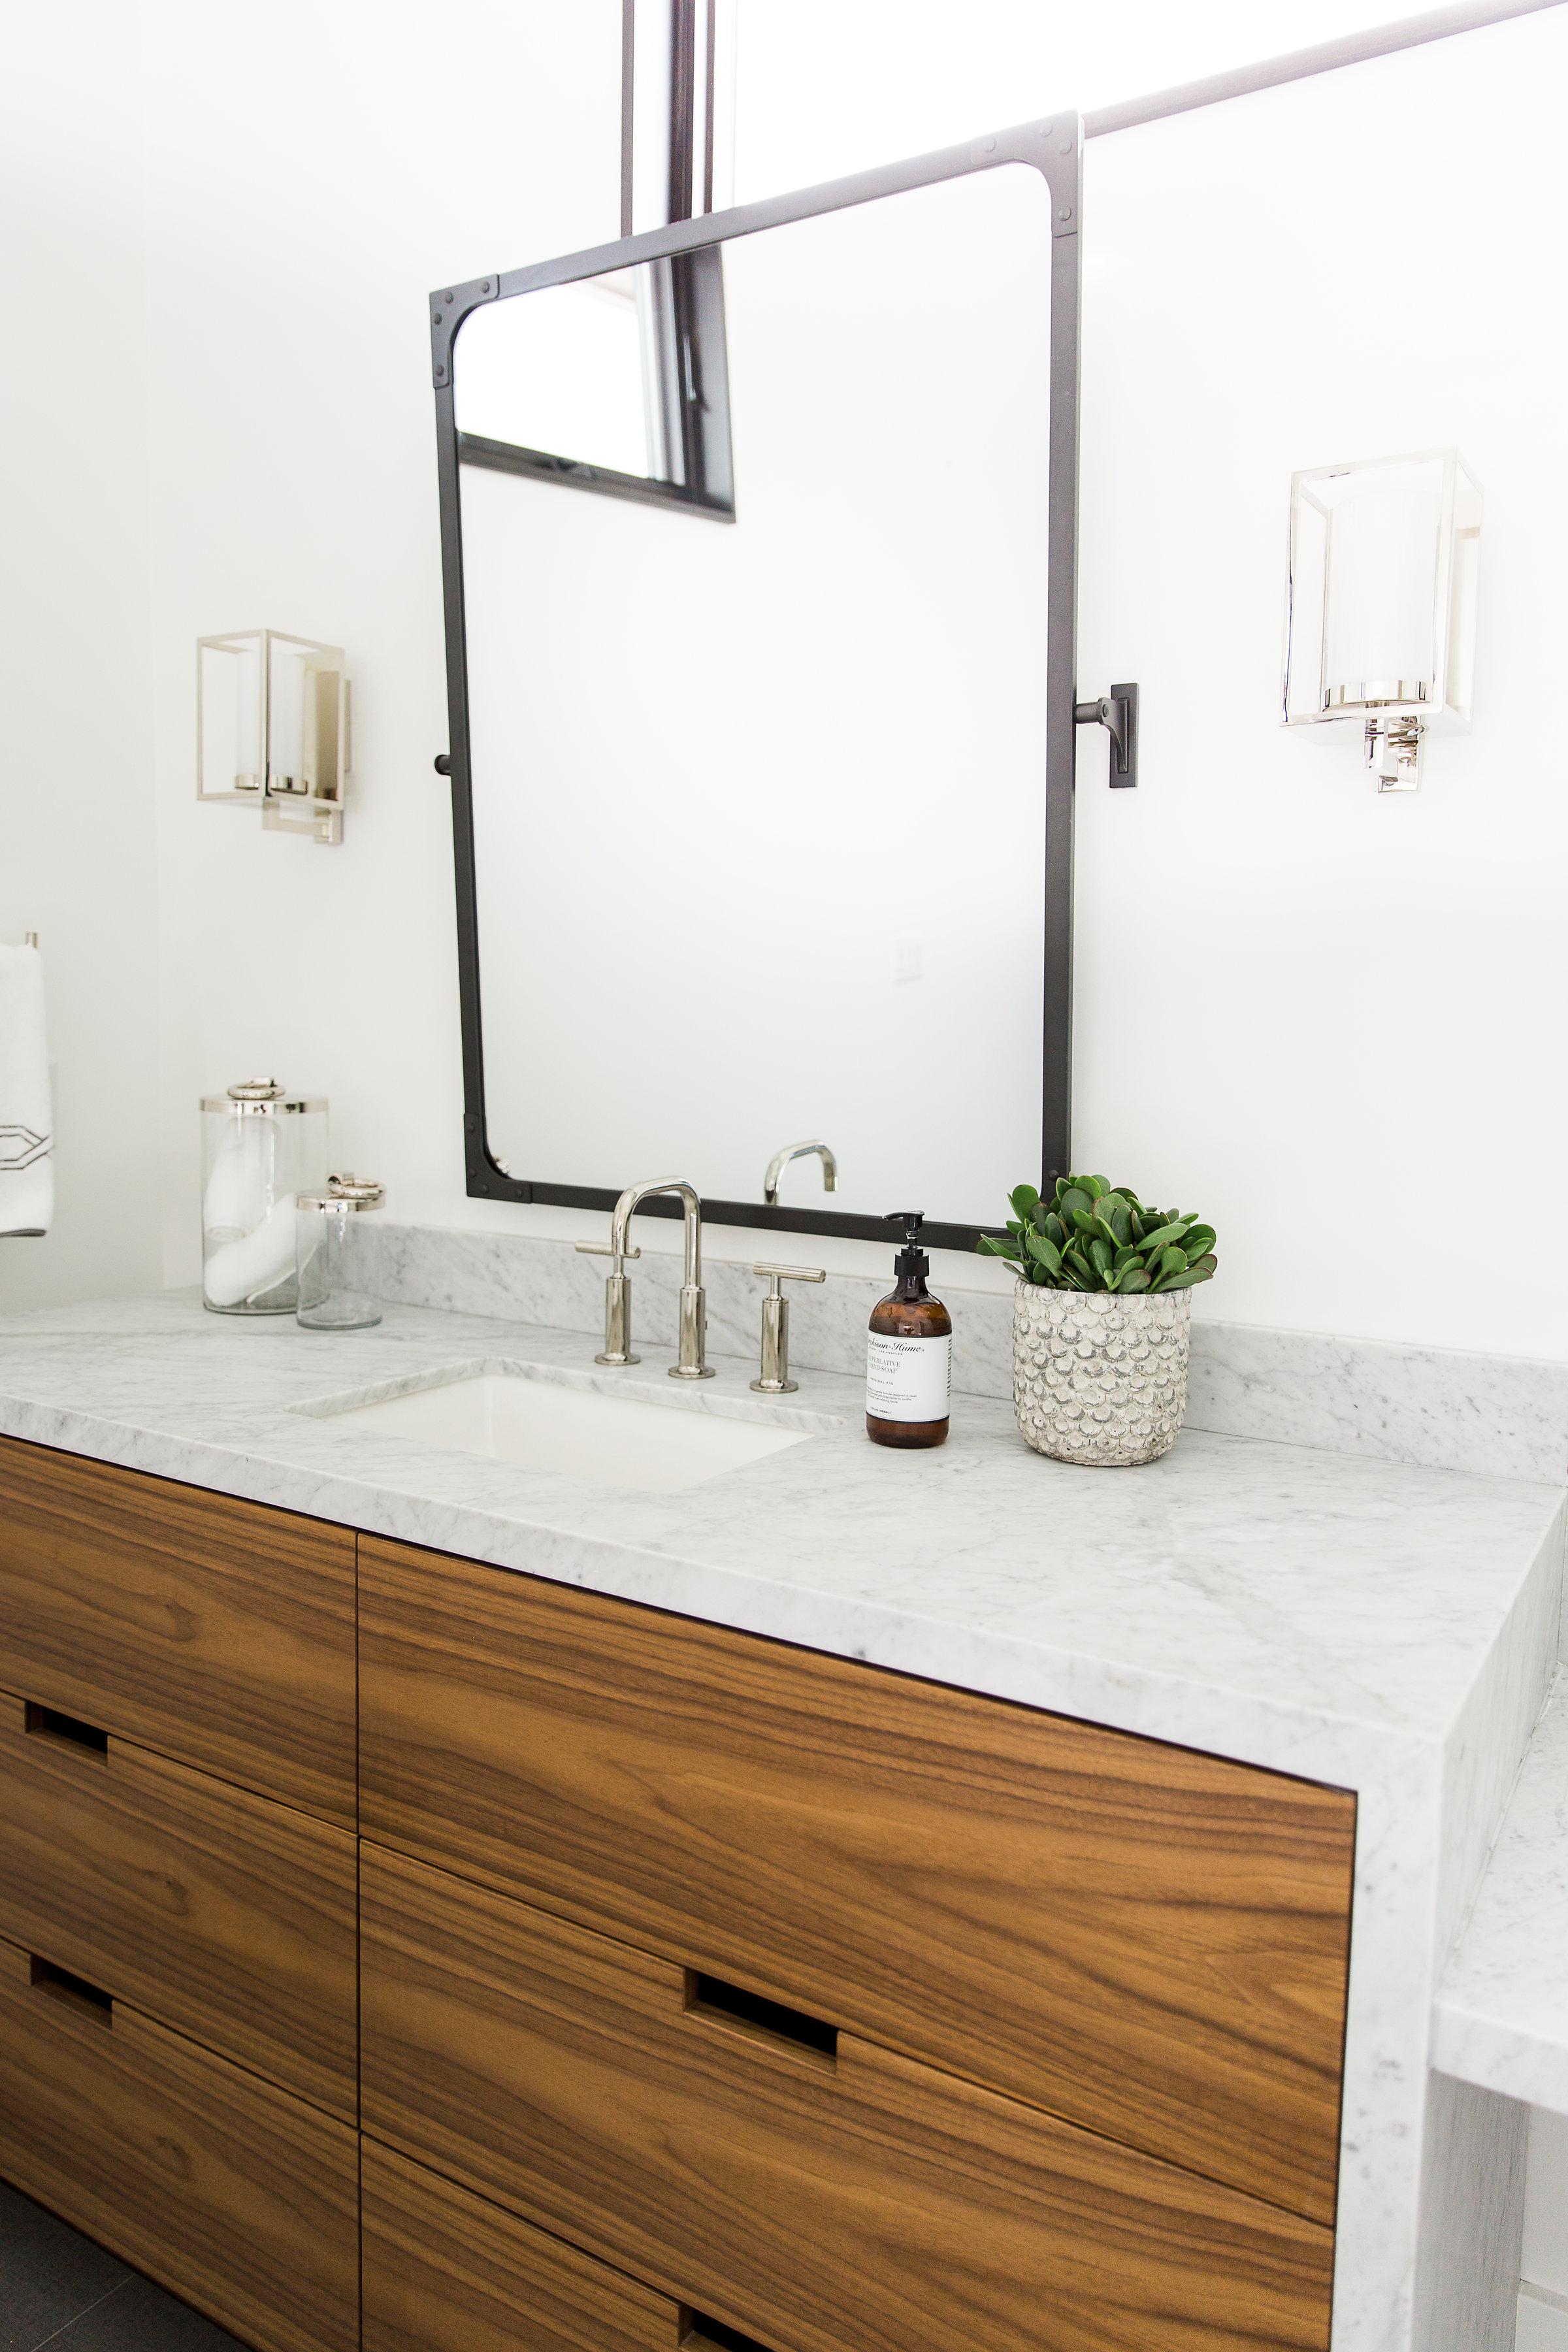 Waterfall edge on bathroom vanity || Studio McGee